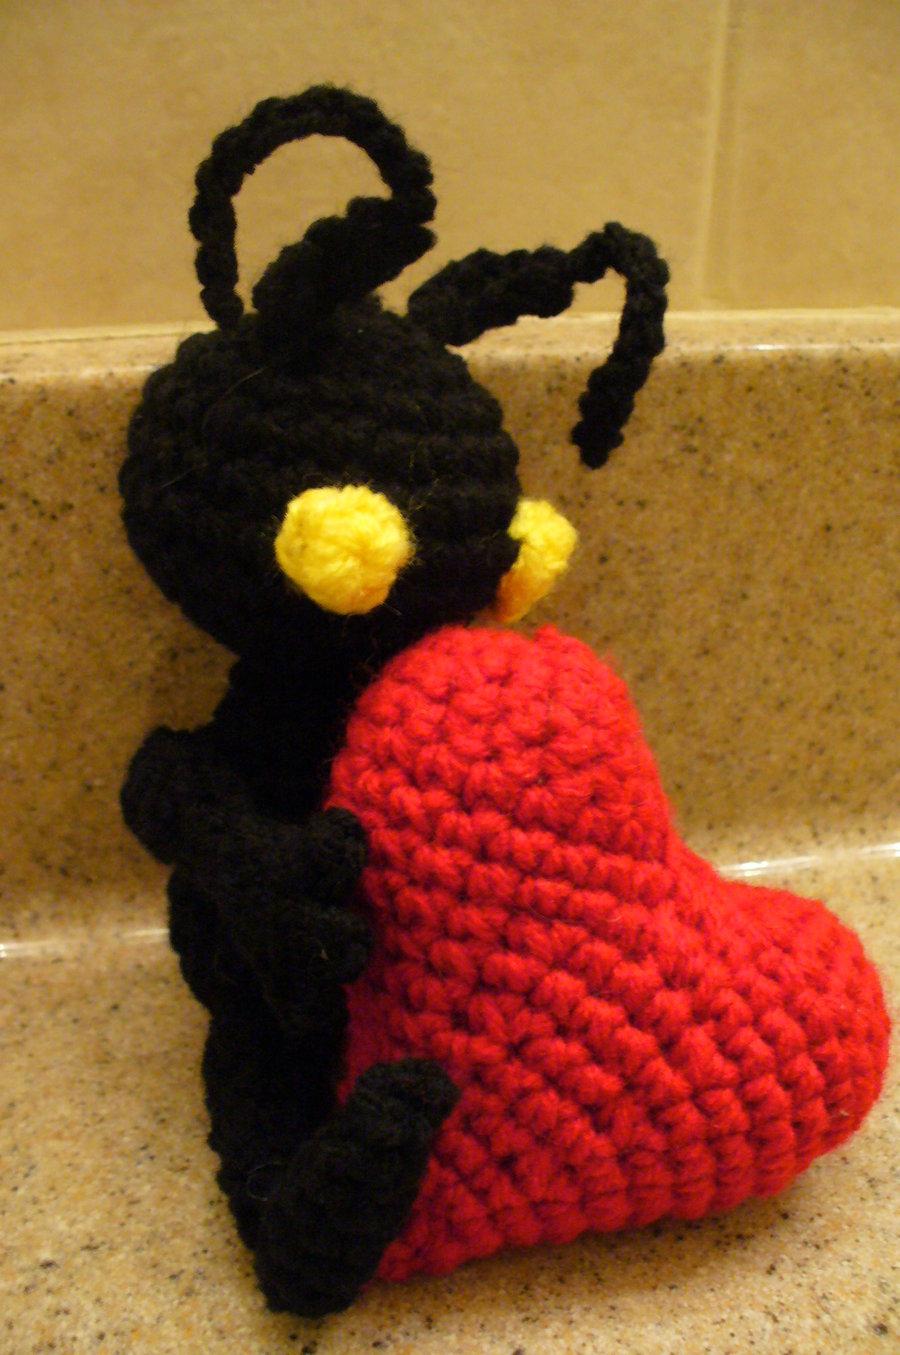 Kingdom Hearts Free Crochet Patterns : OCDrobot: Heartless Crochet Pattern